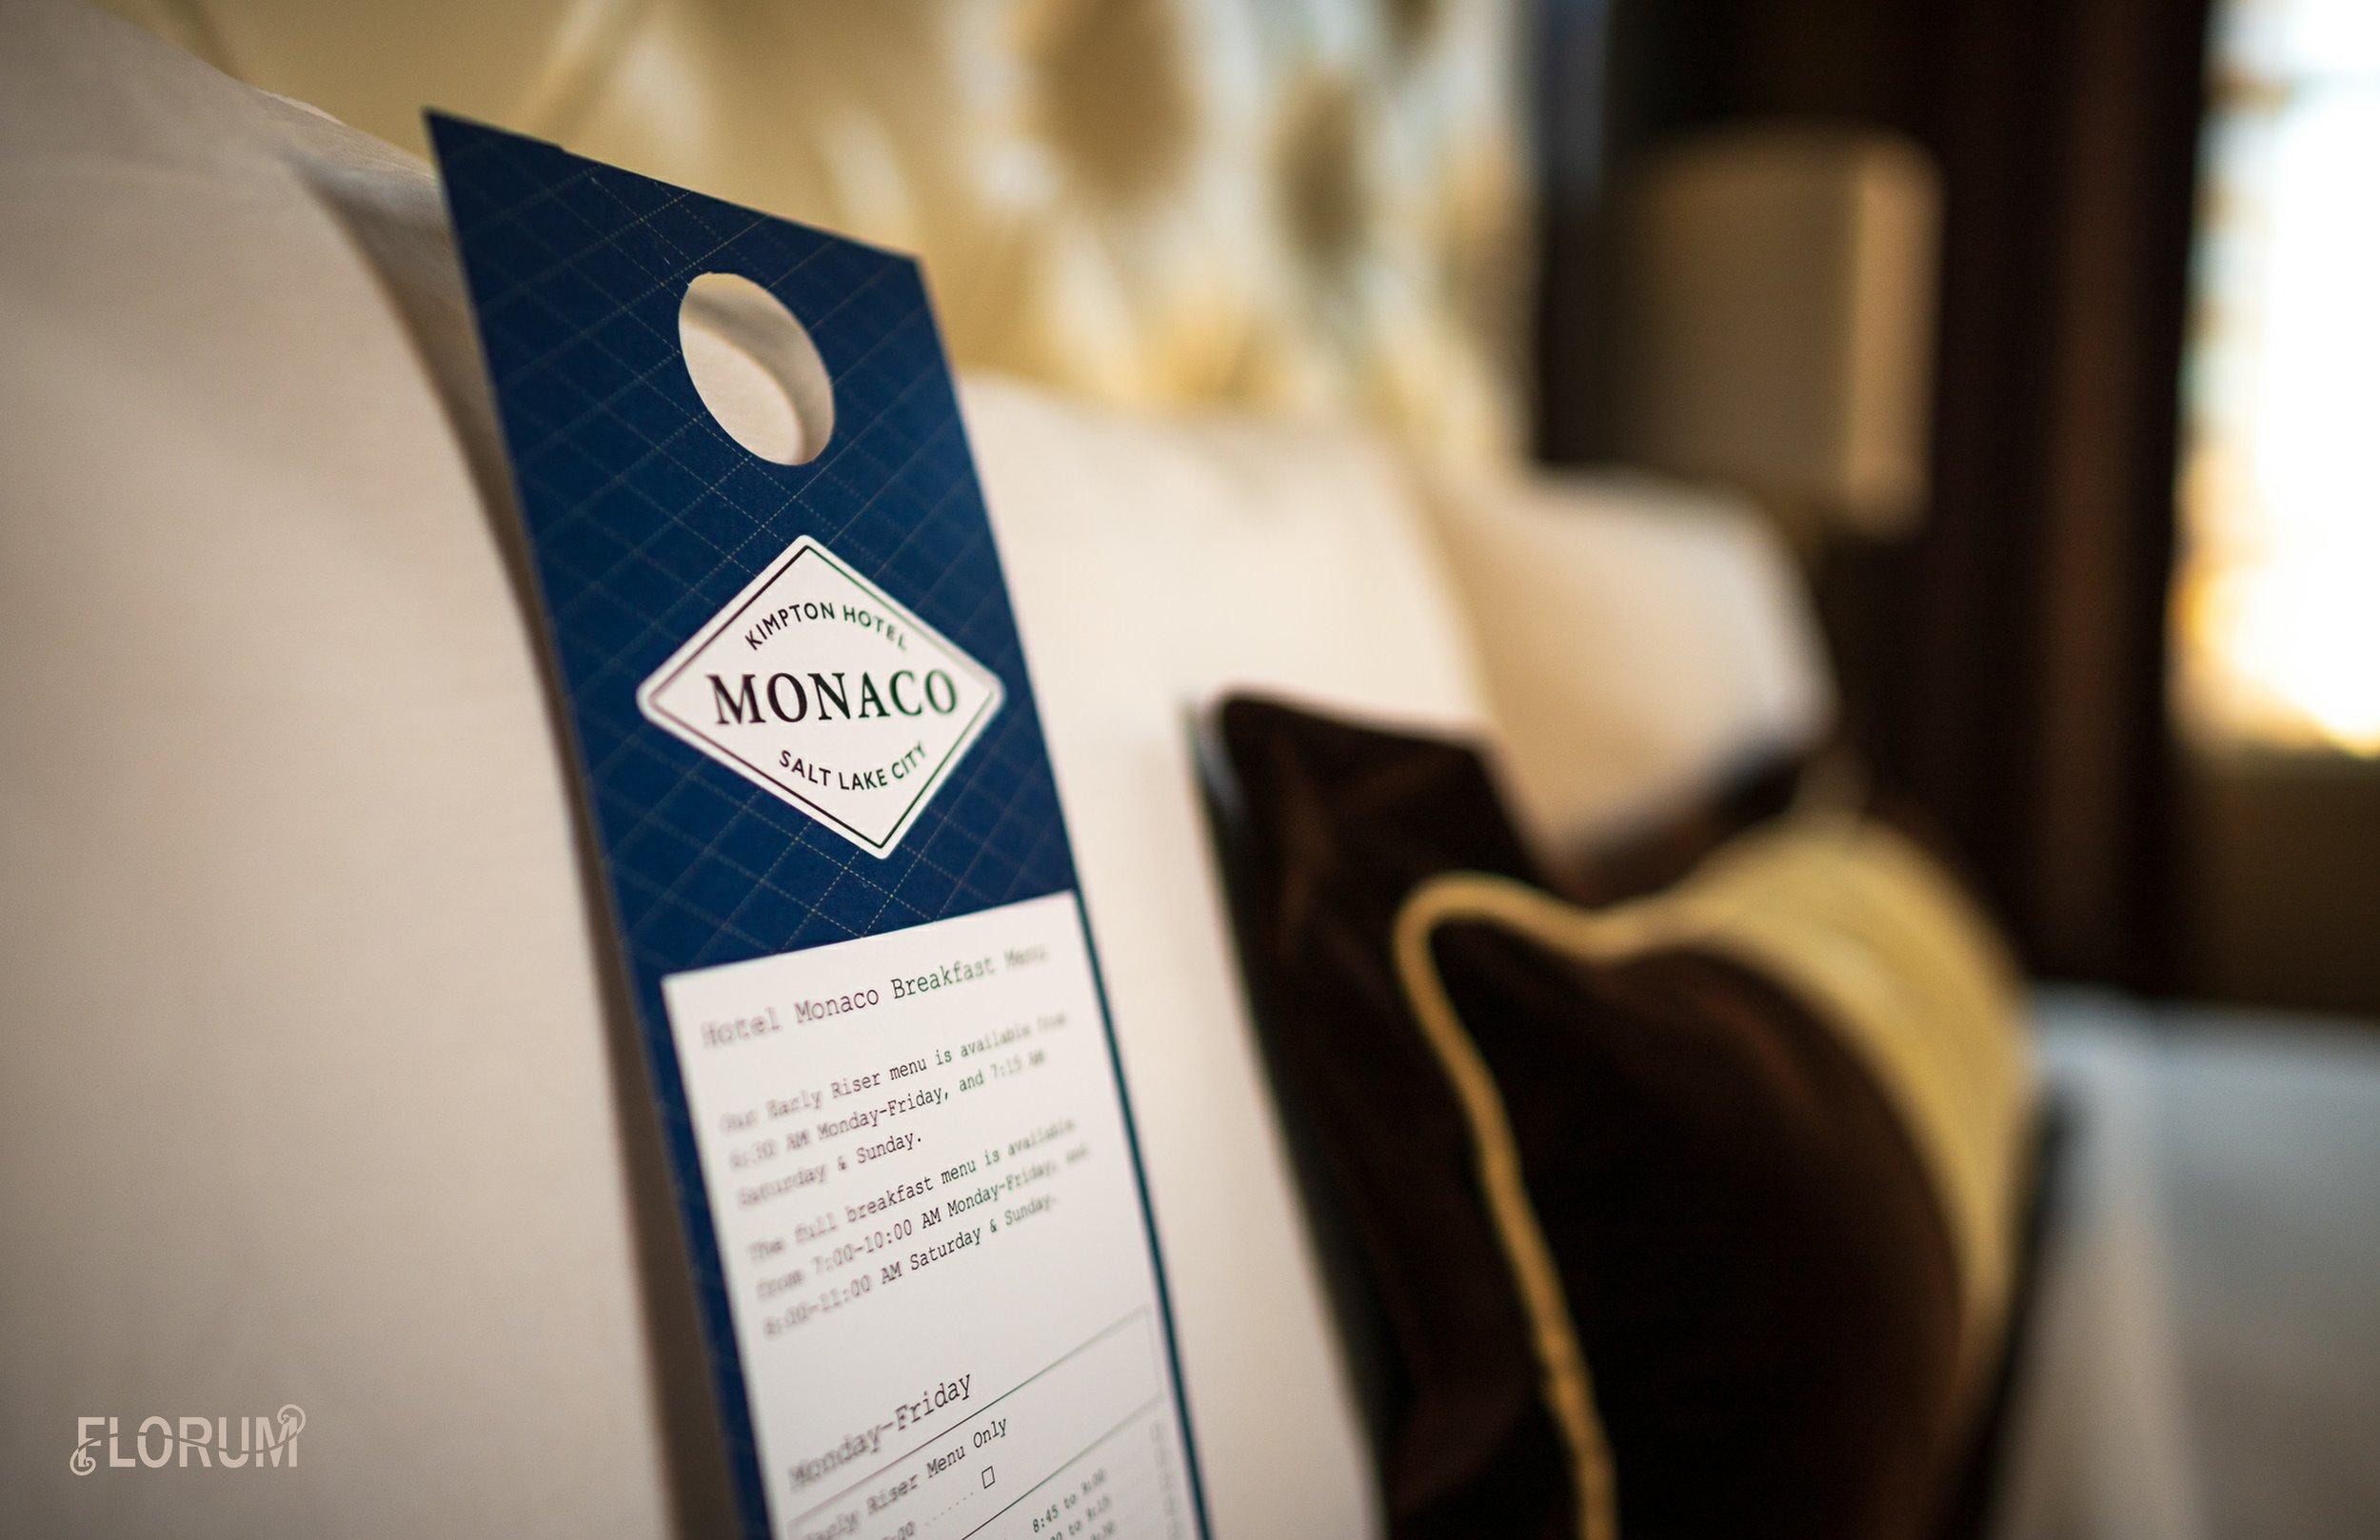 Salt Lake City - Hotel Monaco - Florum Fashion Magazine - Bobby Swingler - Ethical winter fashion - eco travel - noelle lynne17.jpg